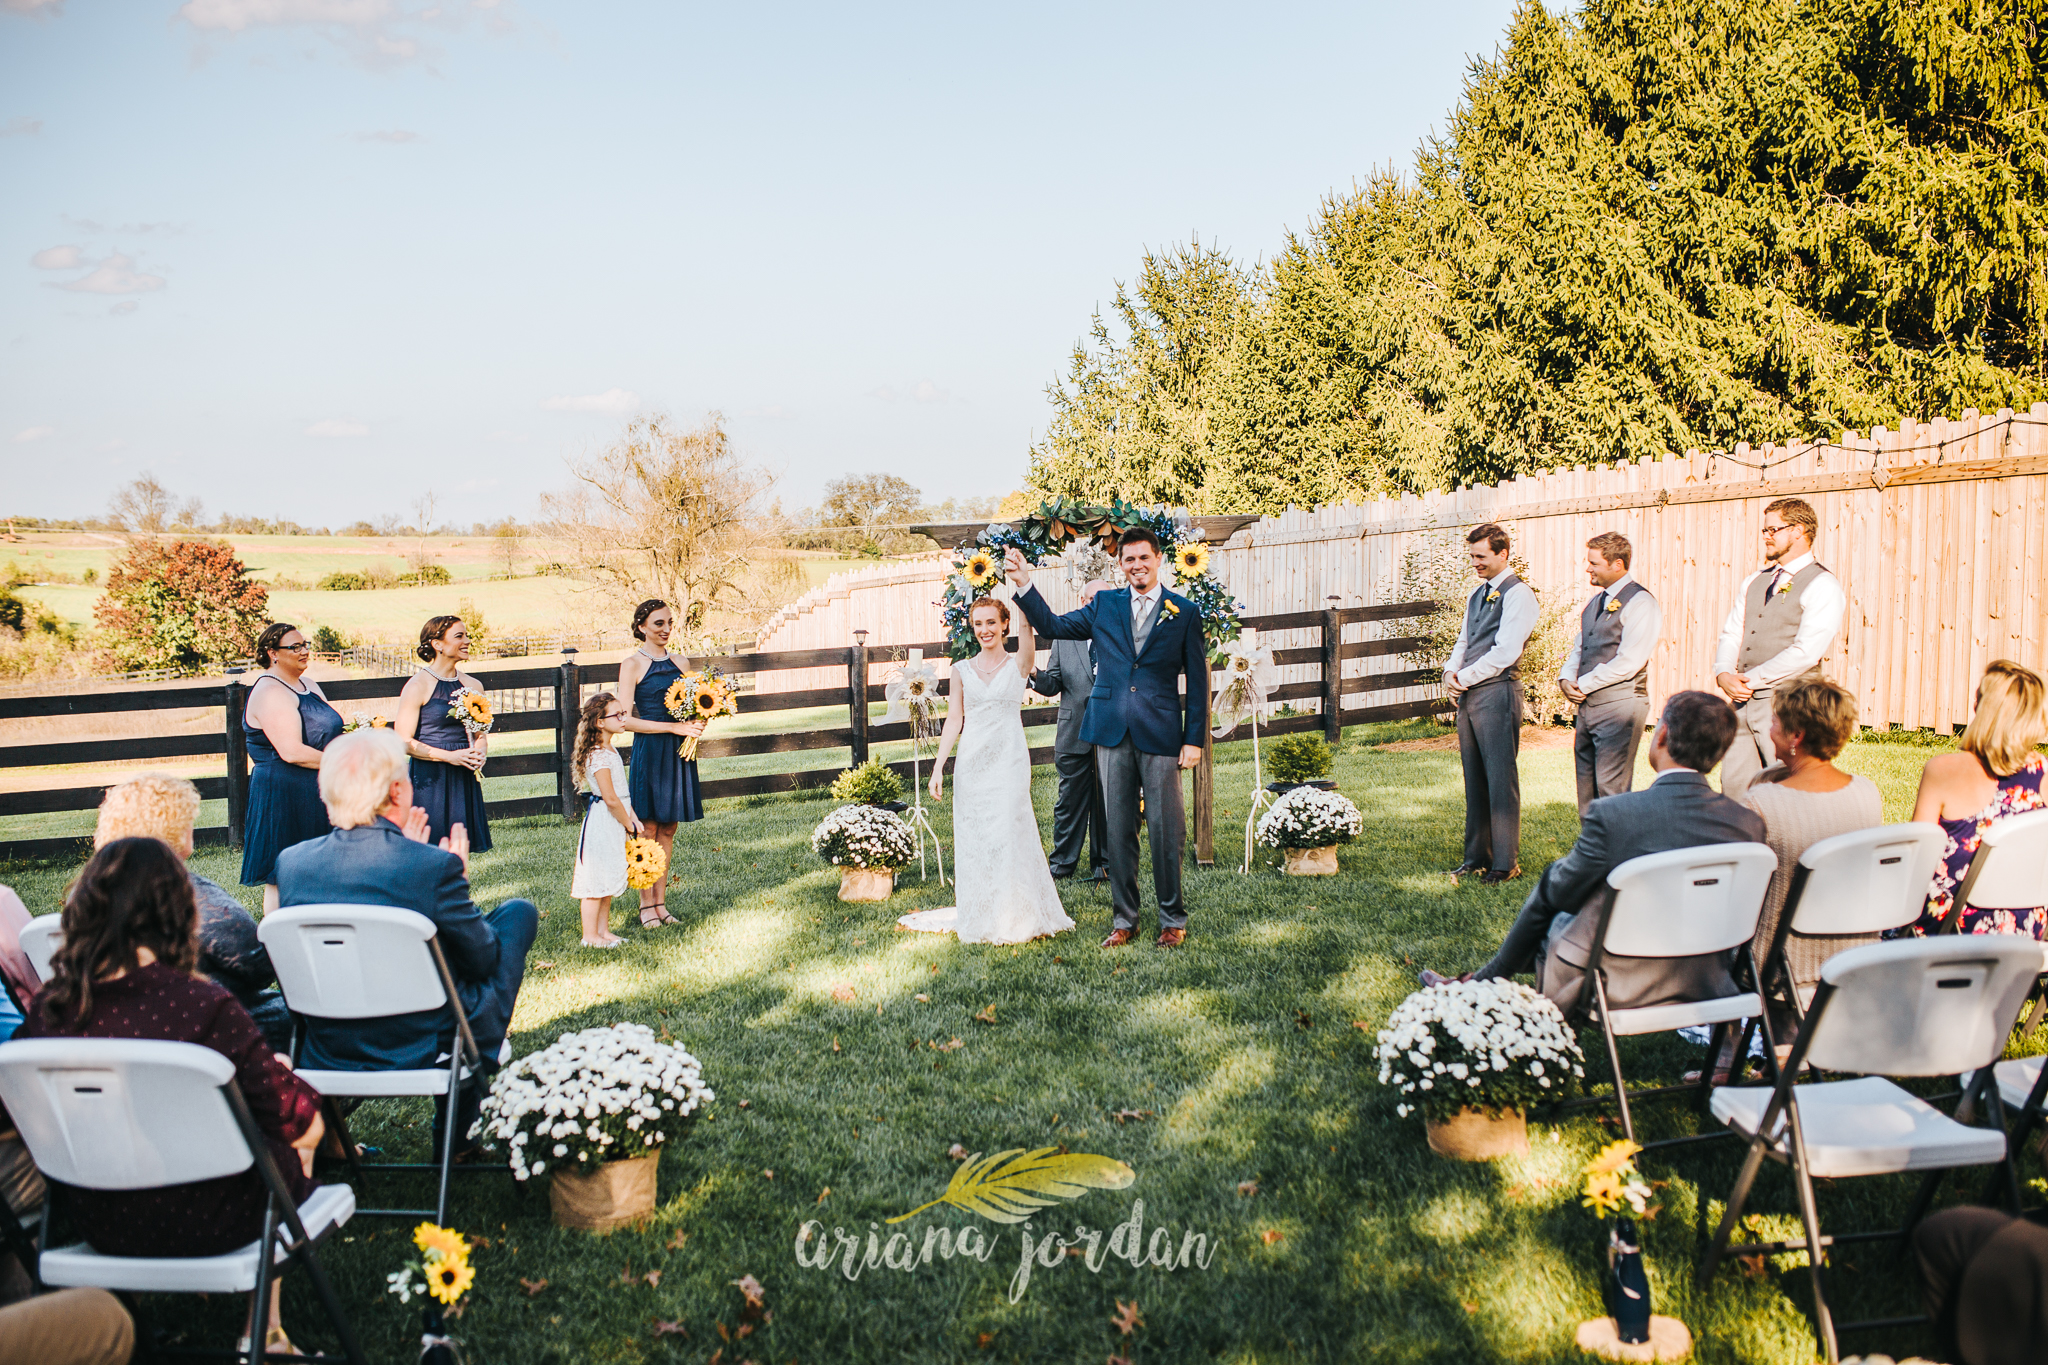 079 Ariana Jordan Photography -Moonlight Fields Lexington Ky Wedding Photographer 1543.jpg